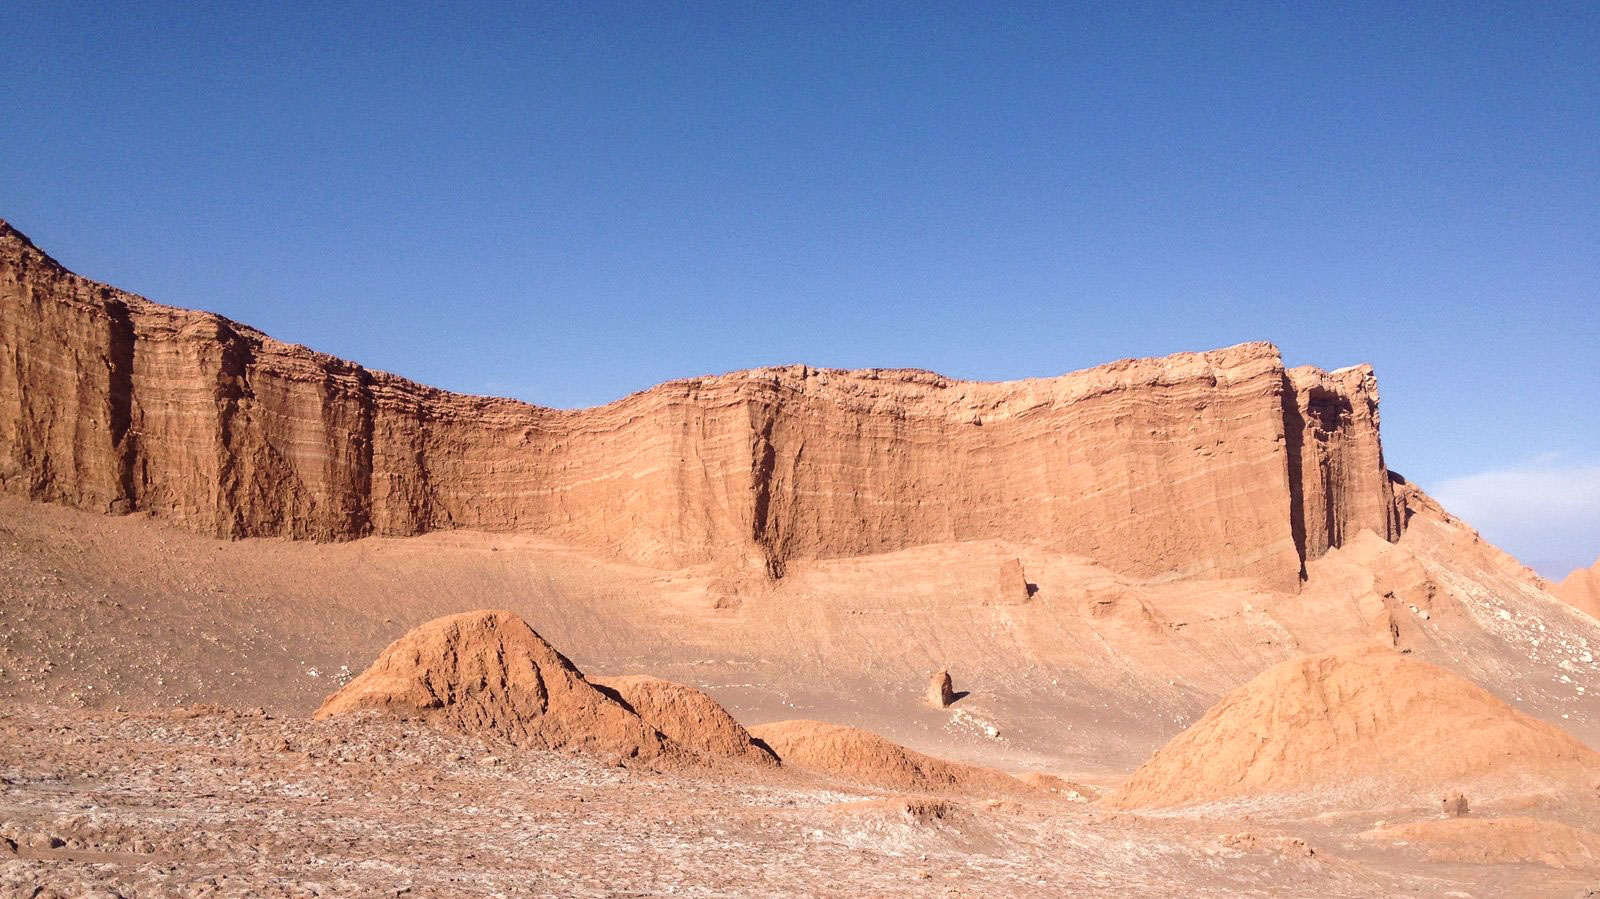 Since Adams left Alaska, deserts—like Chile's Atacama, shown here—have provided new inspiration. John Luther Adams